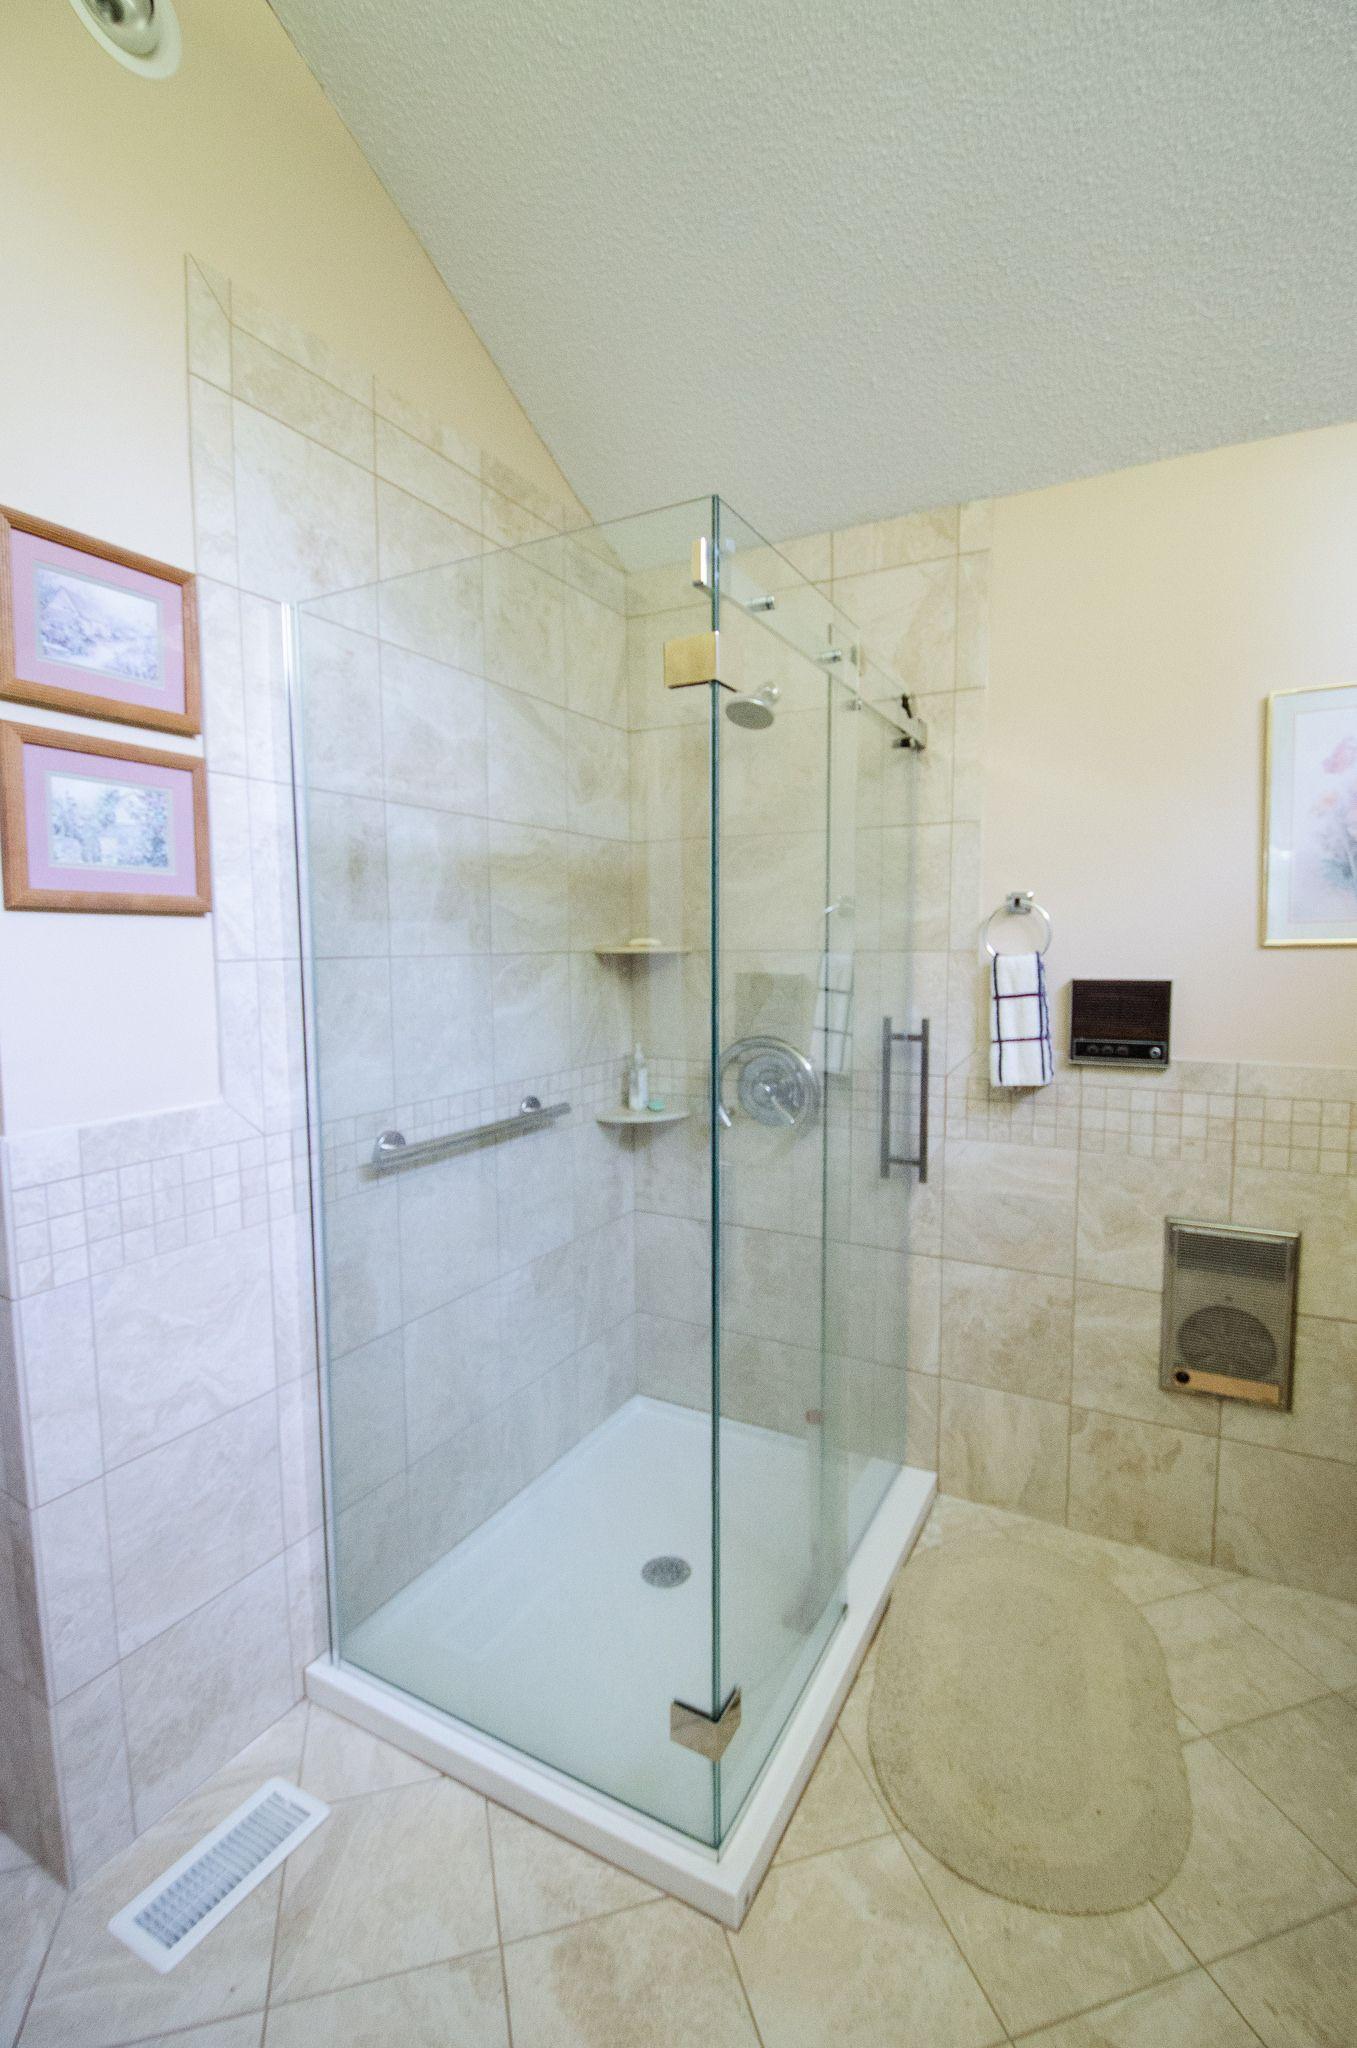 AH138 - After-0010 | Bath remodel, Bathroom trends and Remodel bathroom